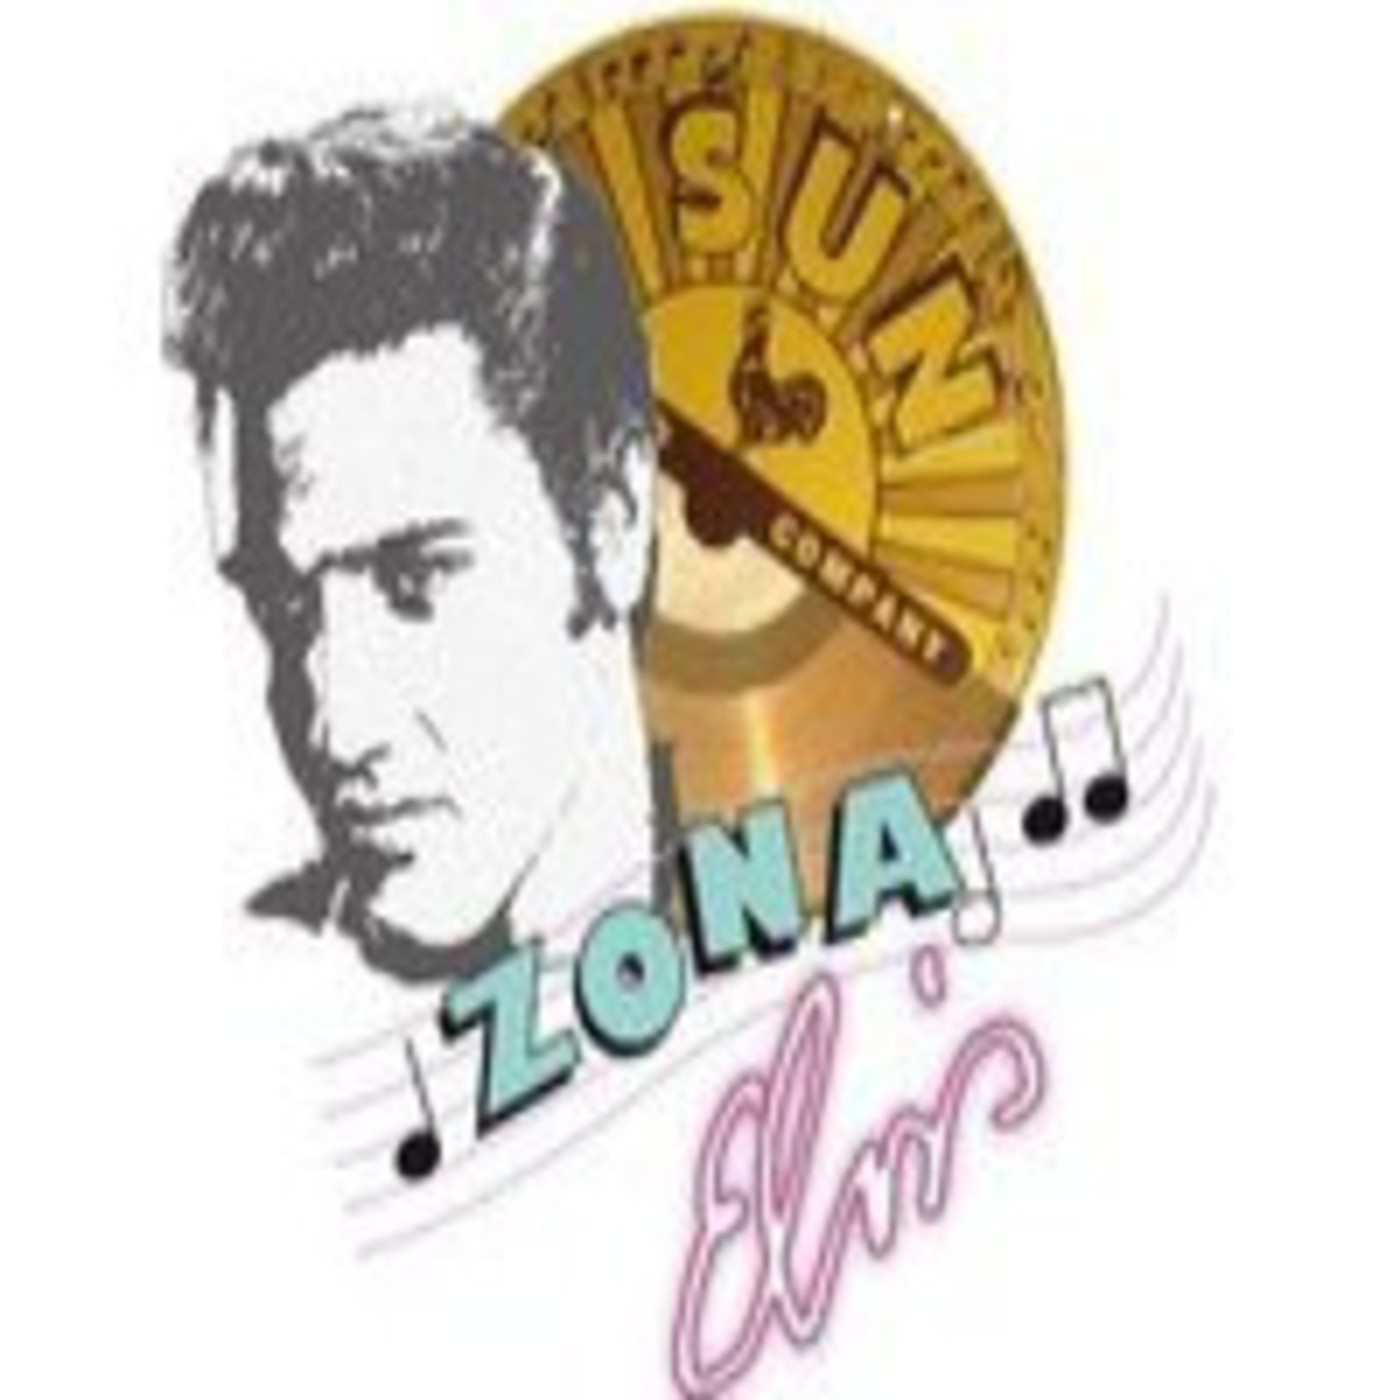 Zona Elvis Madrid (1ª emisión: 15/05/2011)